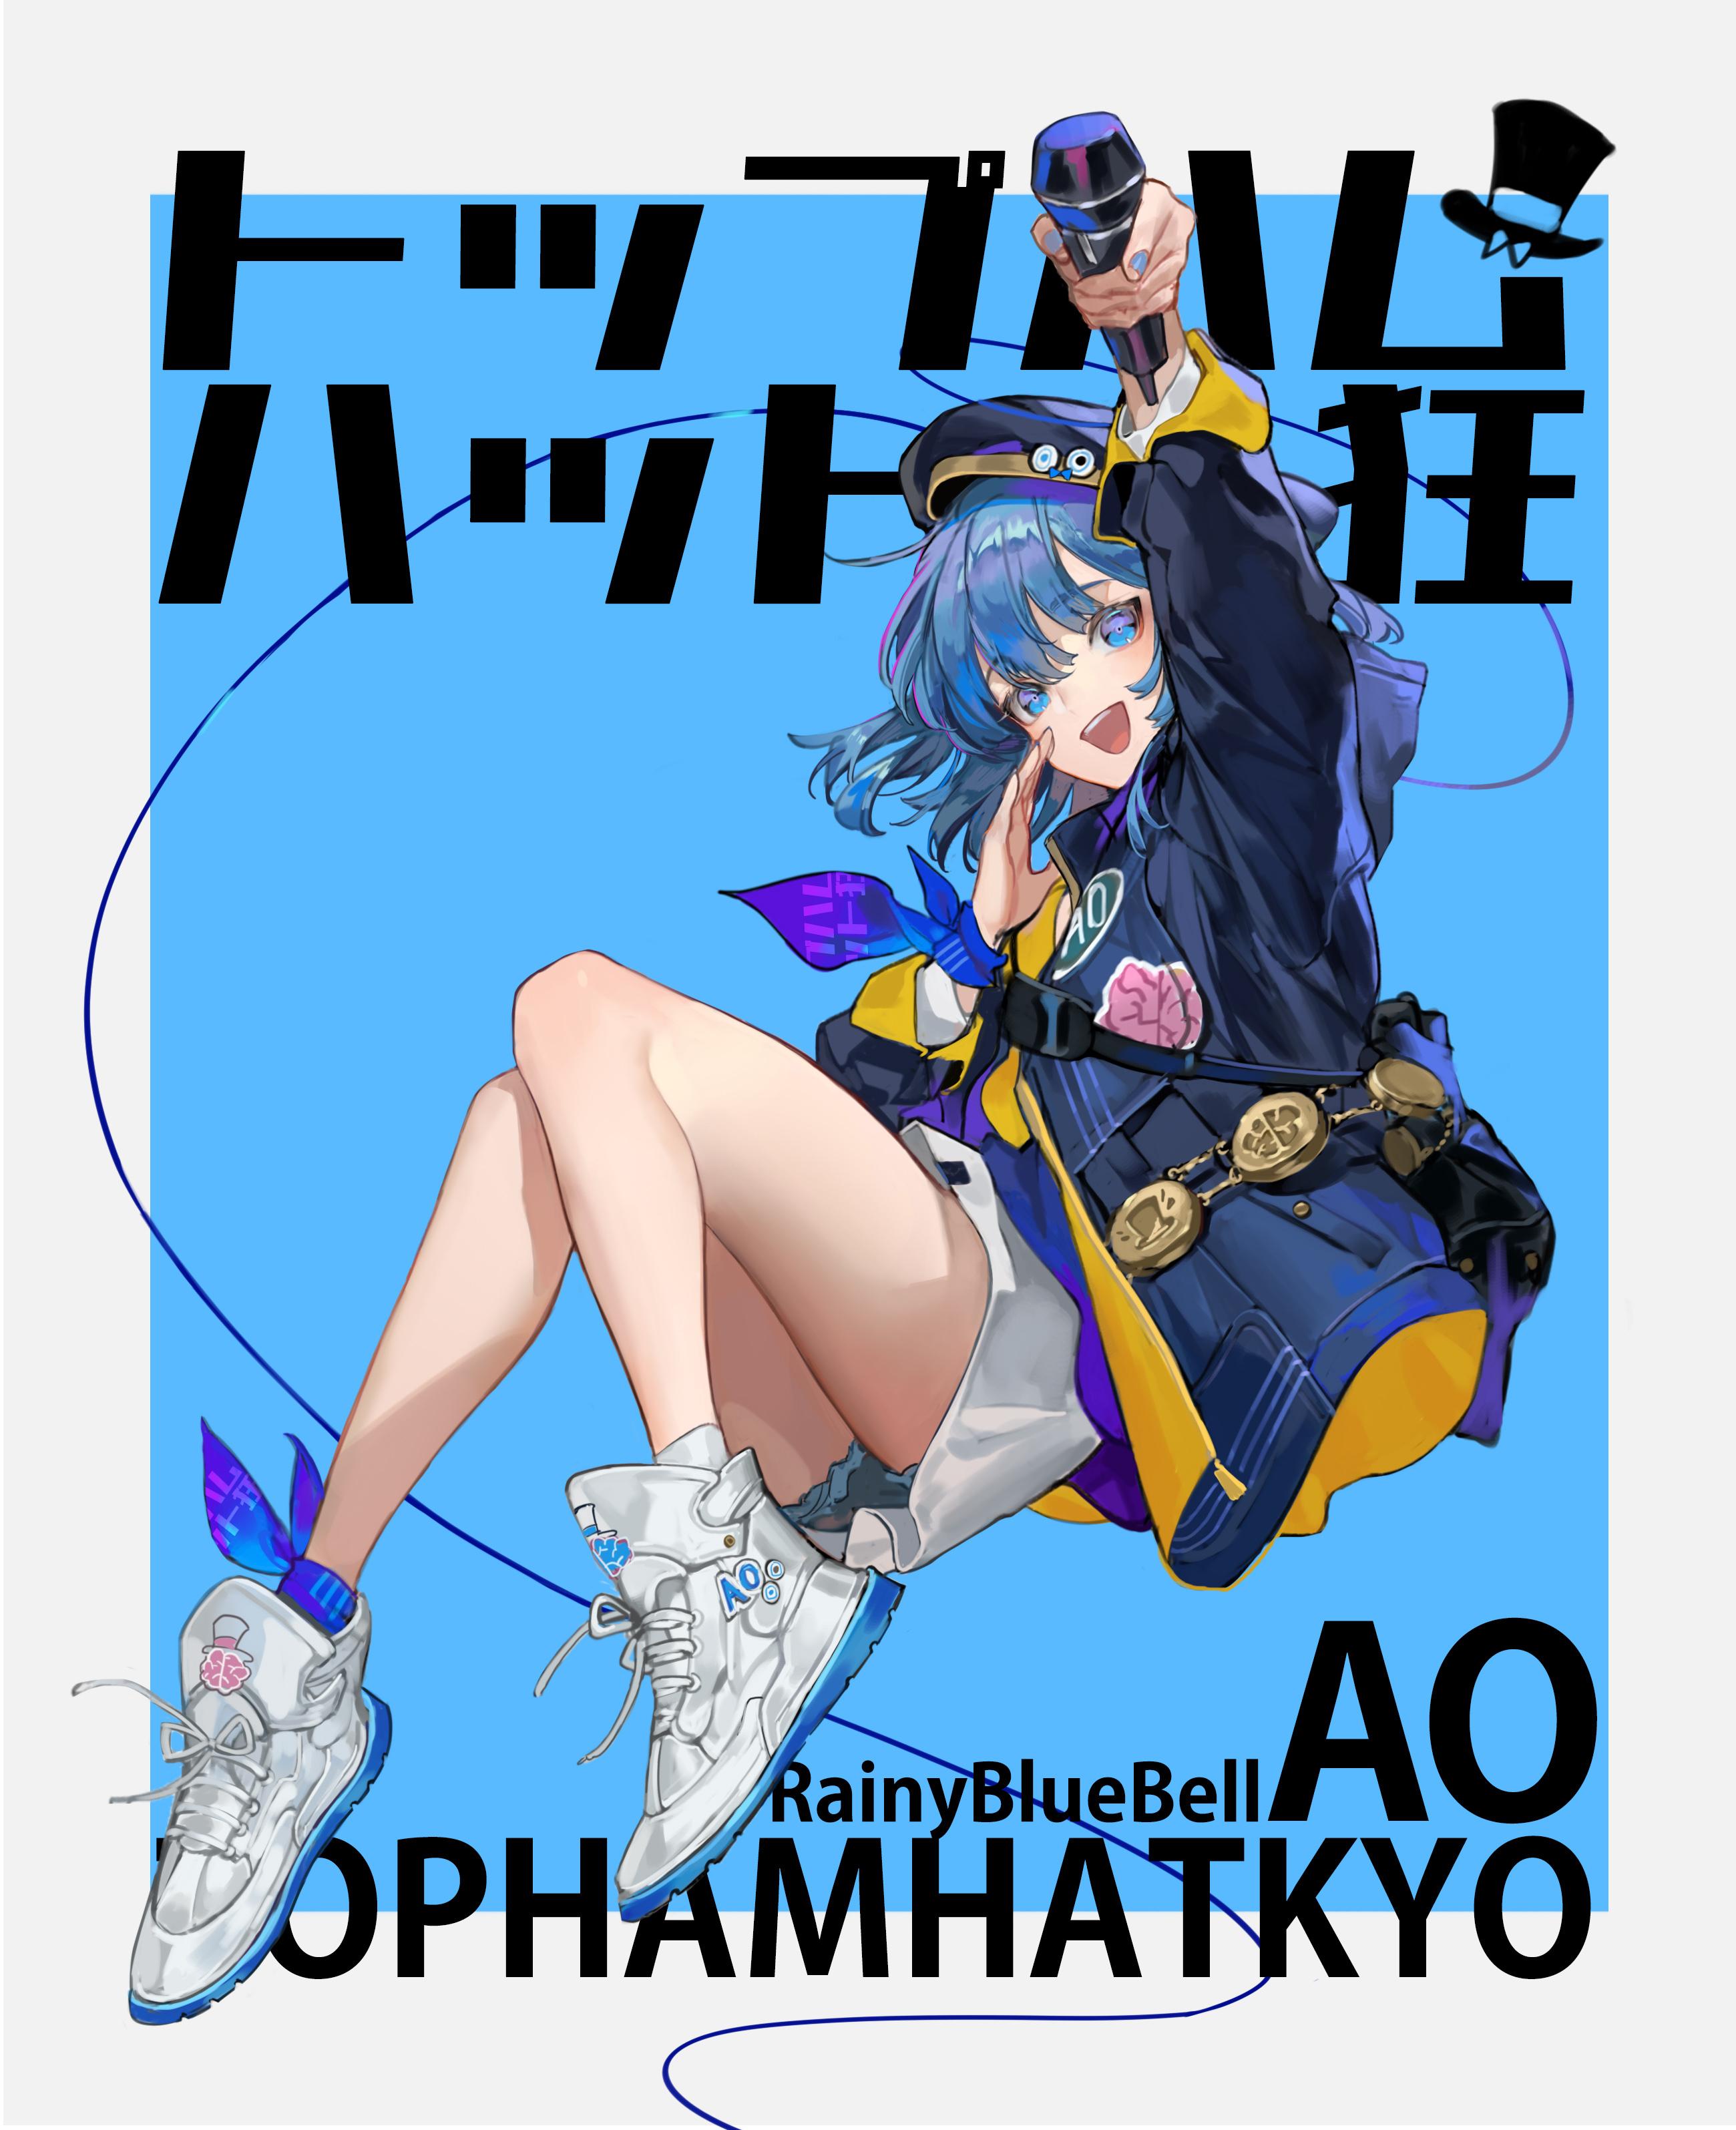 P站画师:韩国画师siki的插画作品一览 【新ACG发布www.xinacg.com】